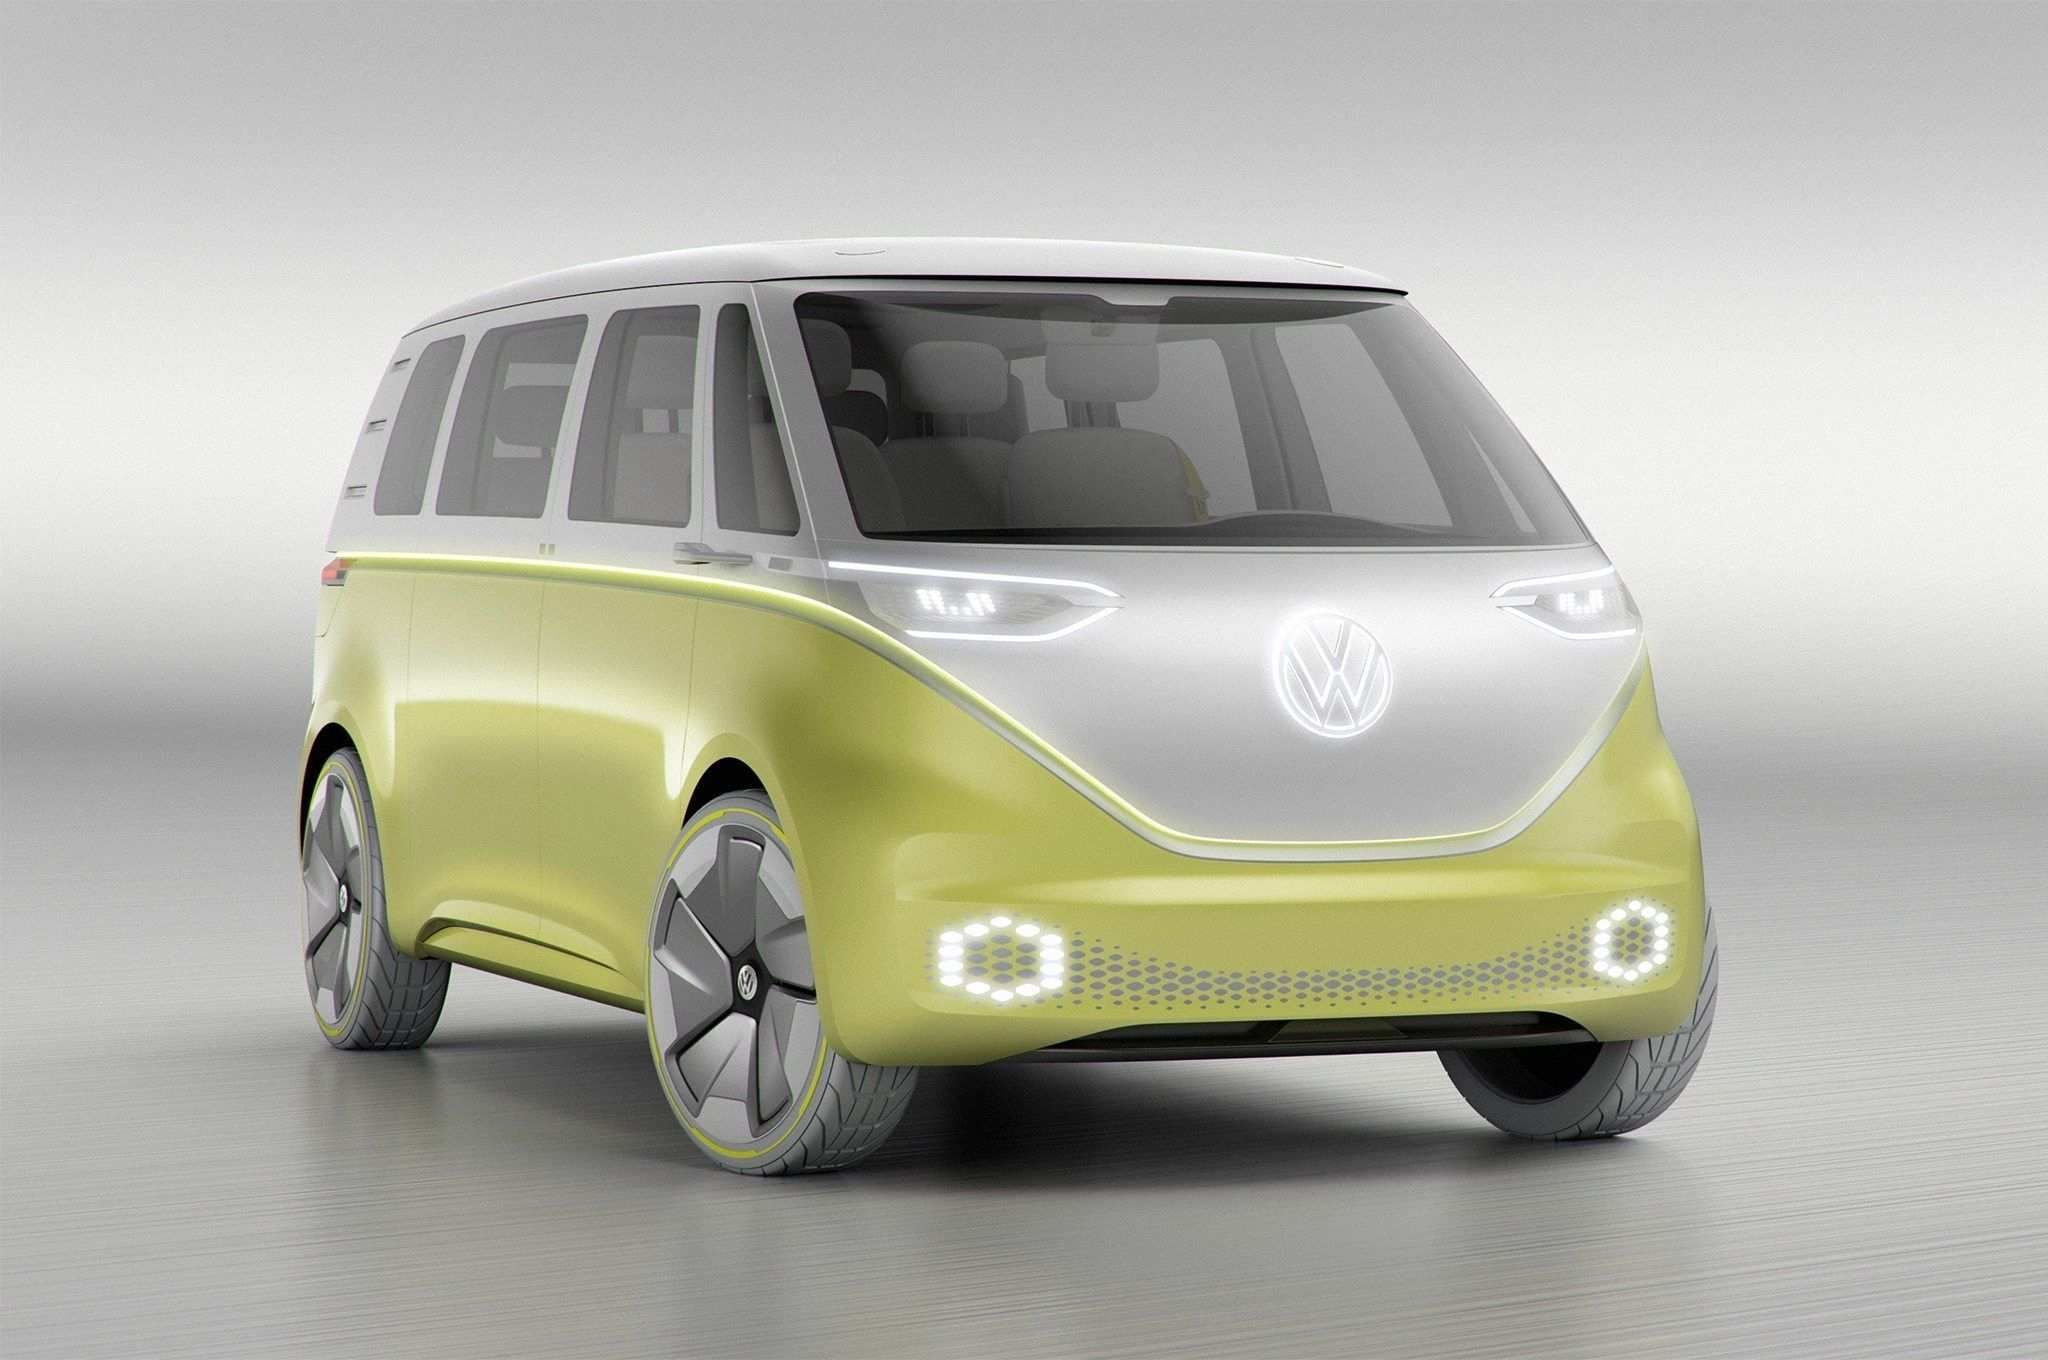 42 Best Review 2020 Volkswagen Bus Price Exterior with 2020 Volkswagen Bus Price